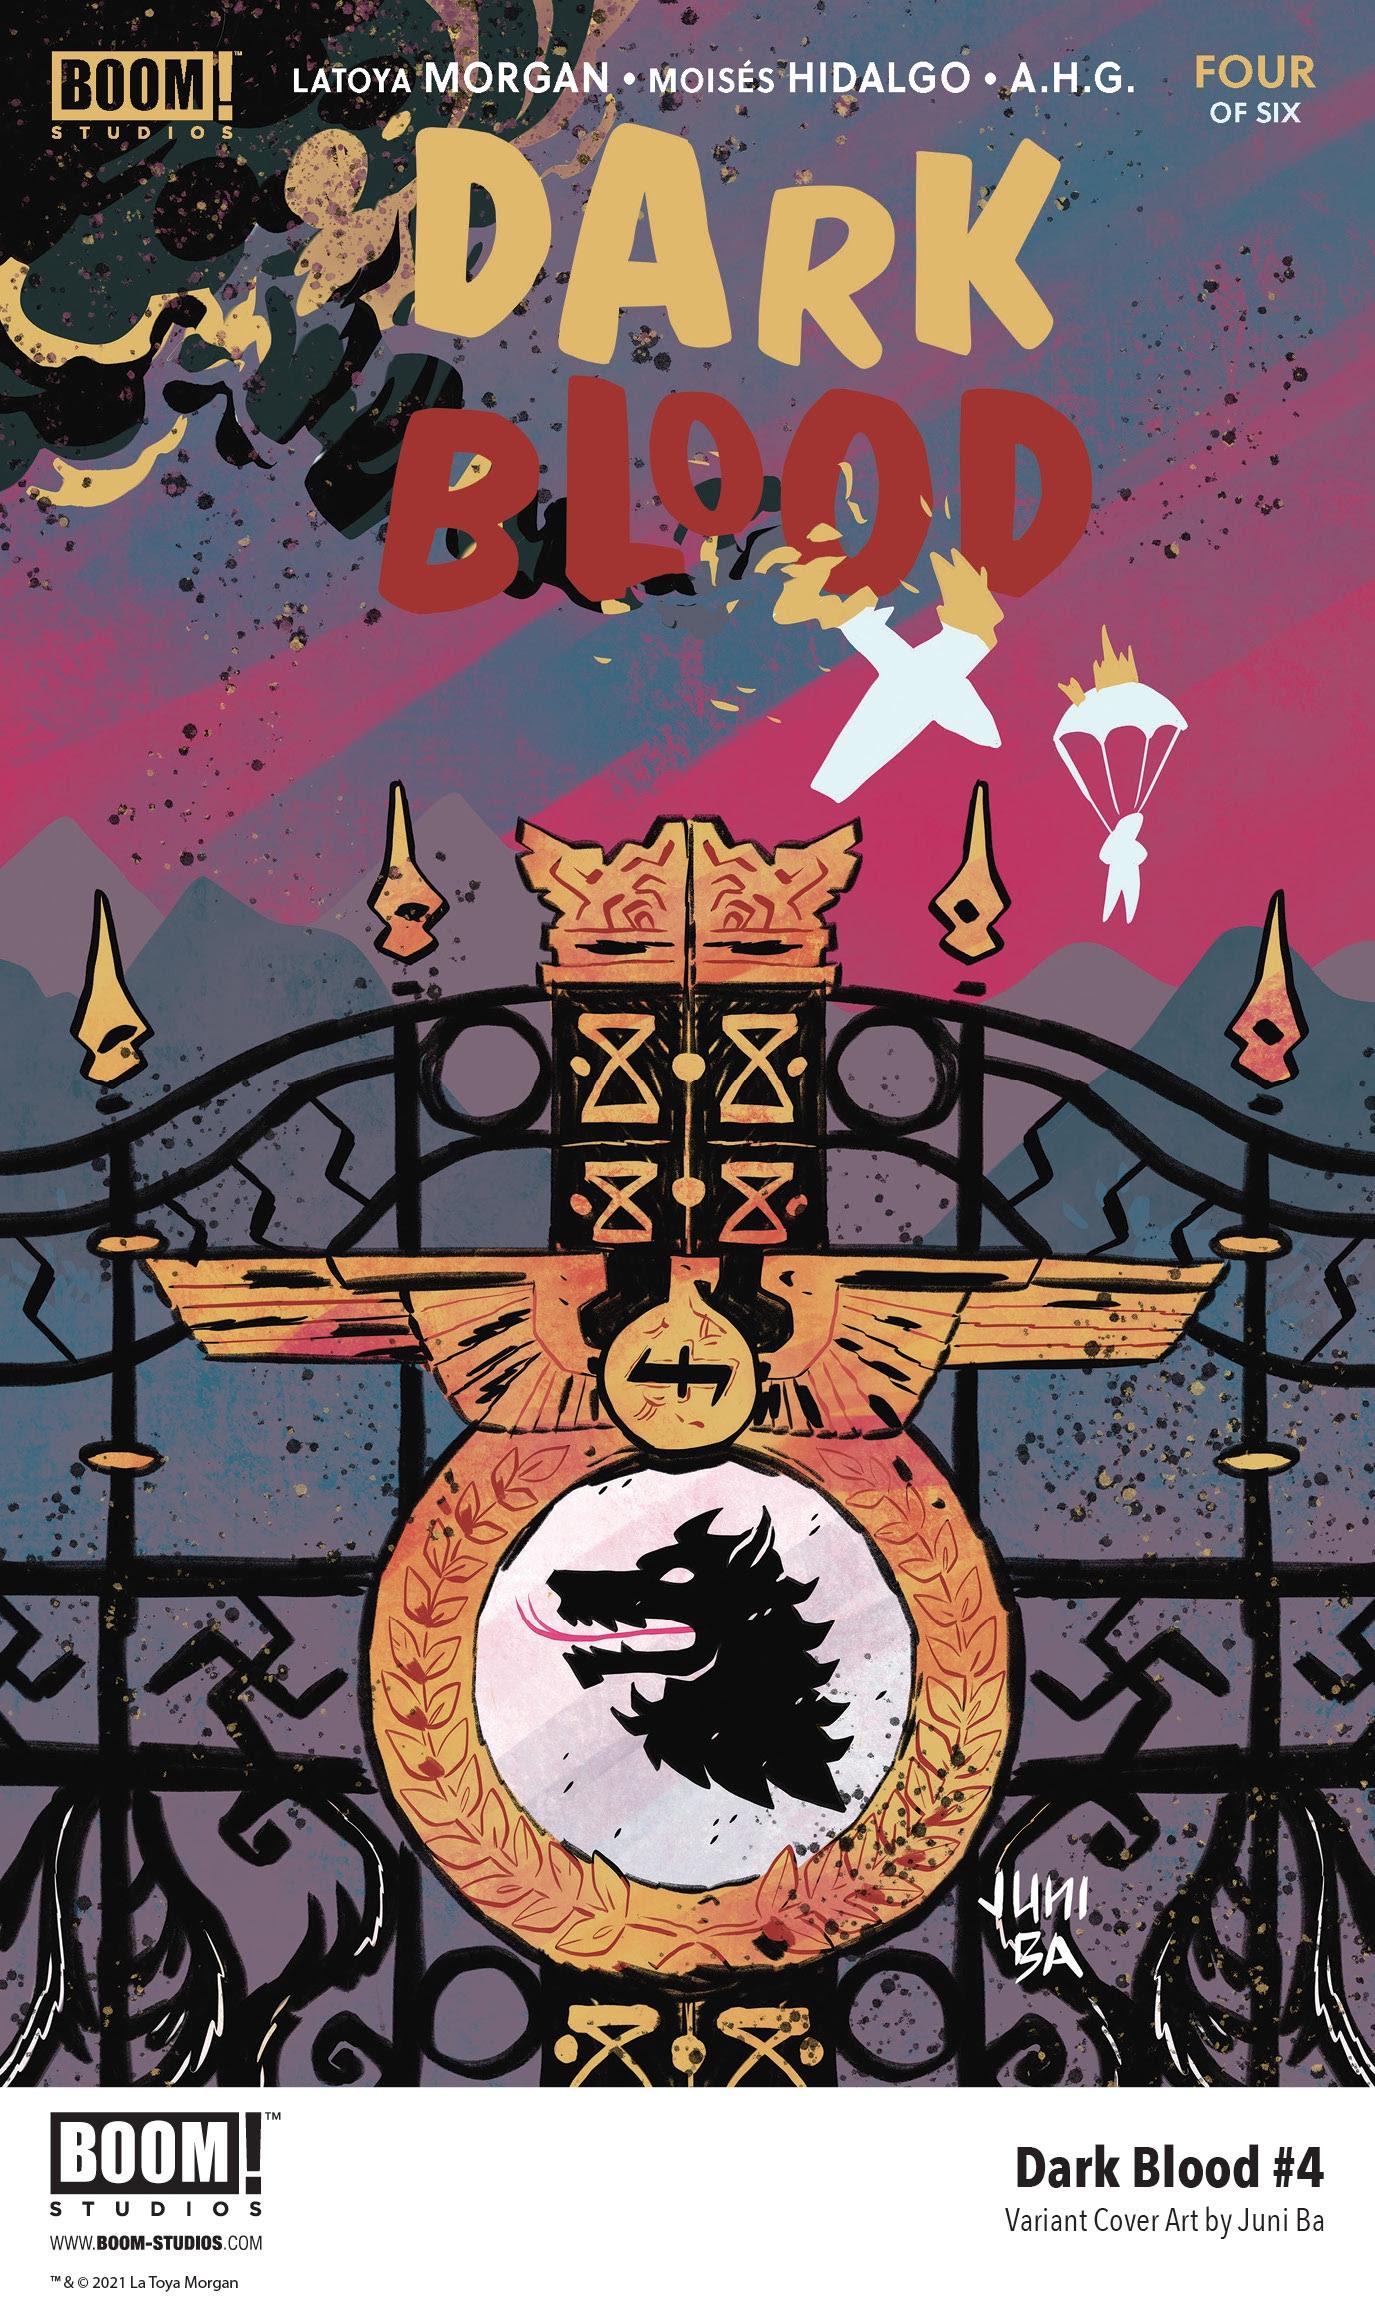 , First Look: LaToya Morgan's DARK BLOOD #4, The Indie Comix Dispatch